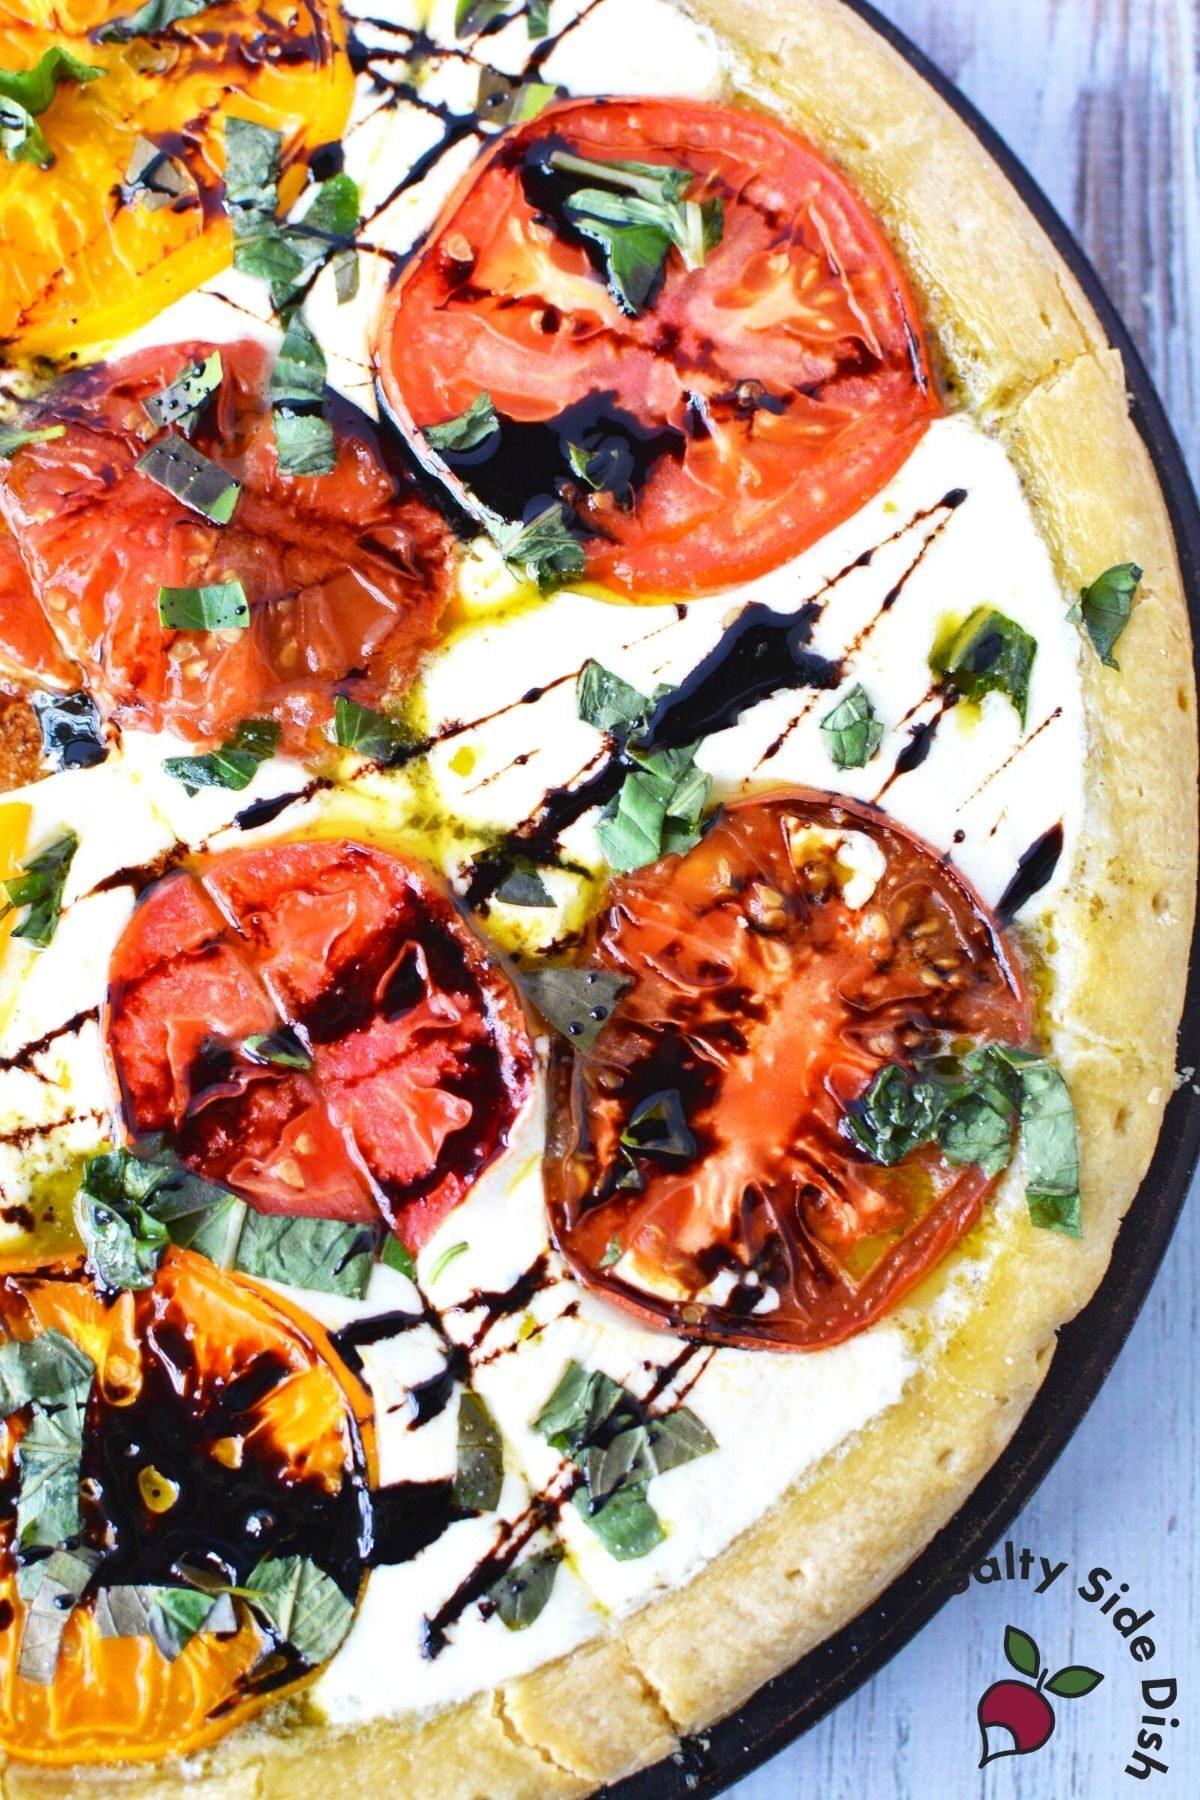 Caprese Pizza with balsamic glaze and garlic crust.